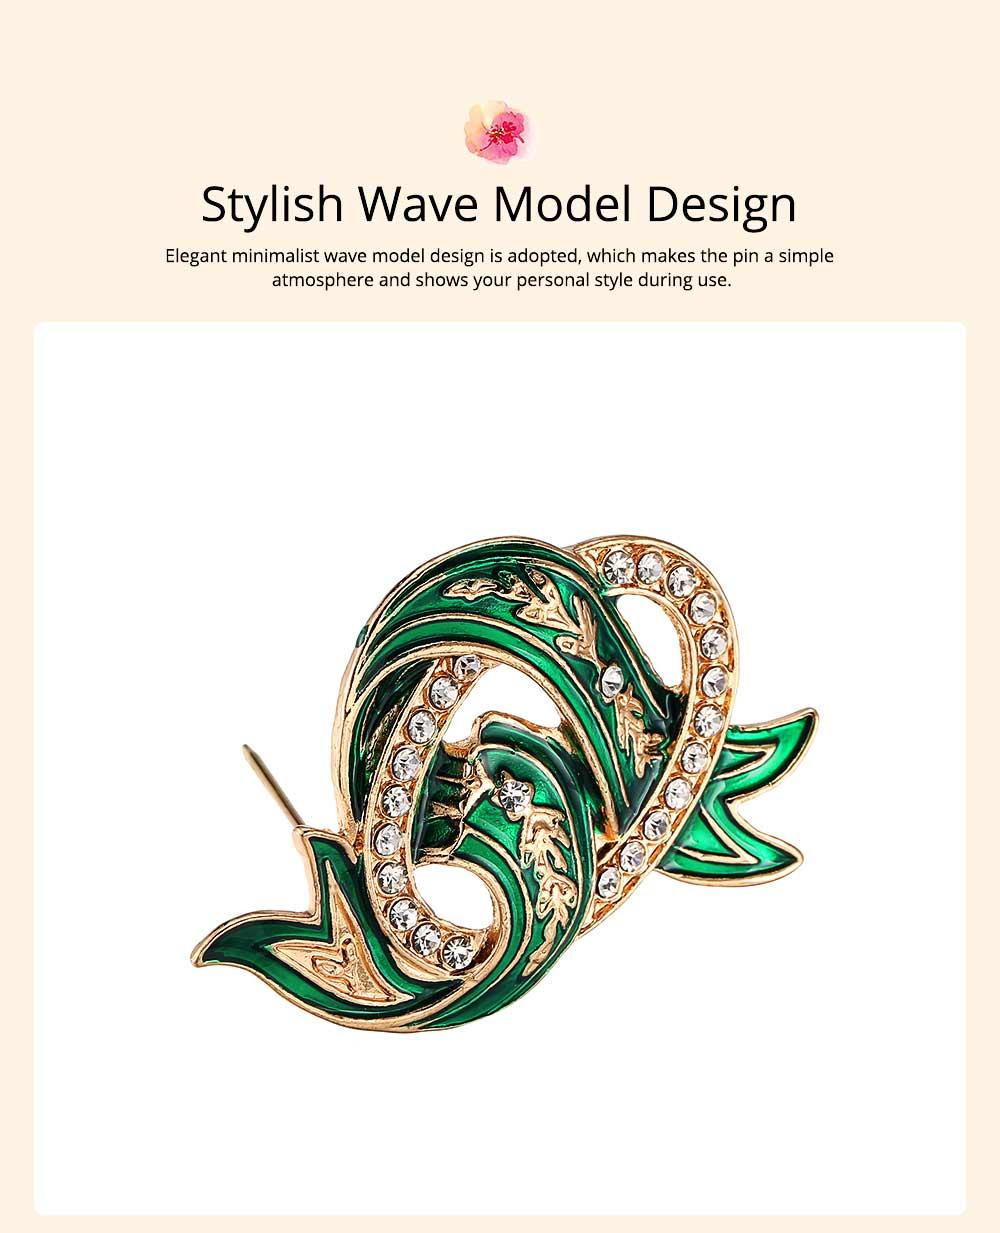 Elegant Green Wave Model Rhinestone Embellishment Alloy Brooch for Women, Scarf Clothes Ornament Accessories Breastpin Women Jewelry 3